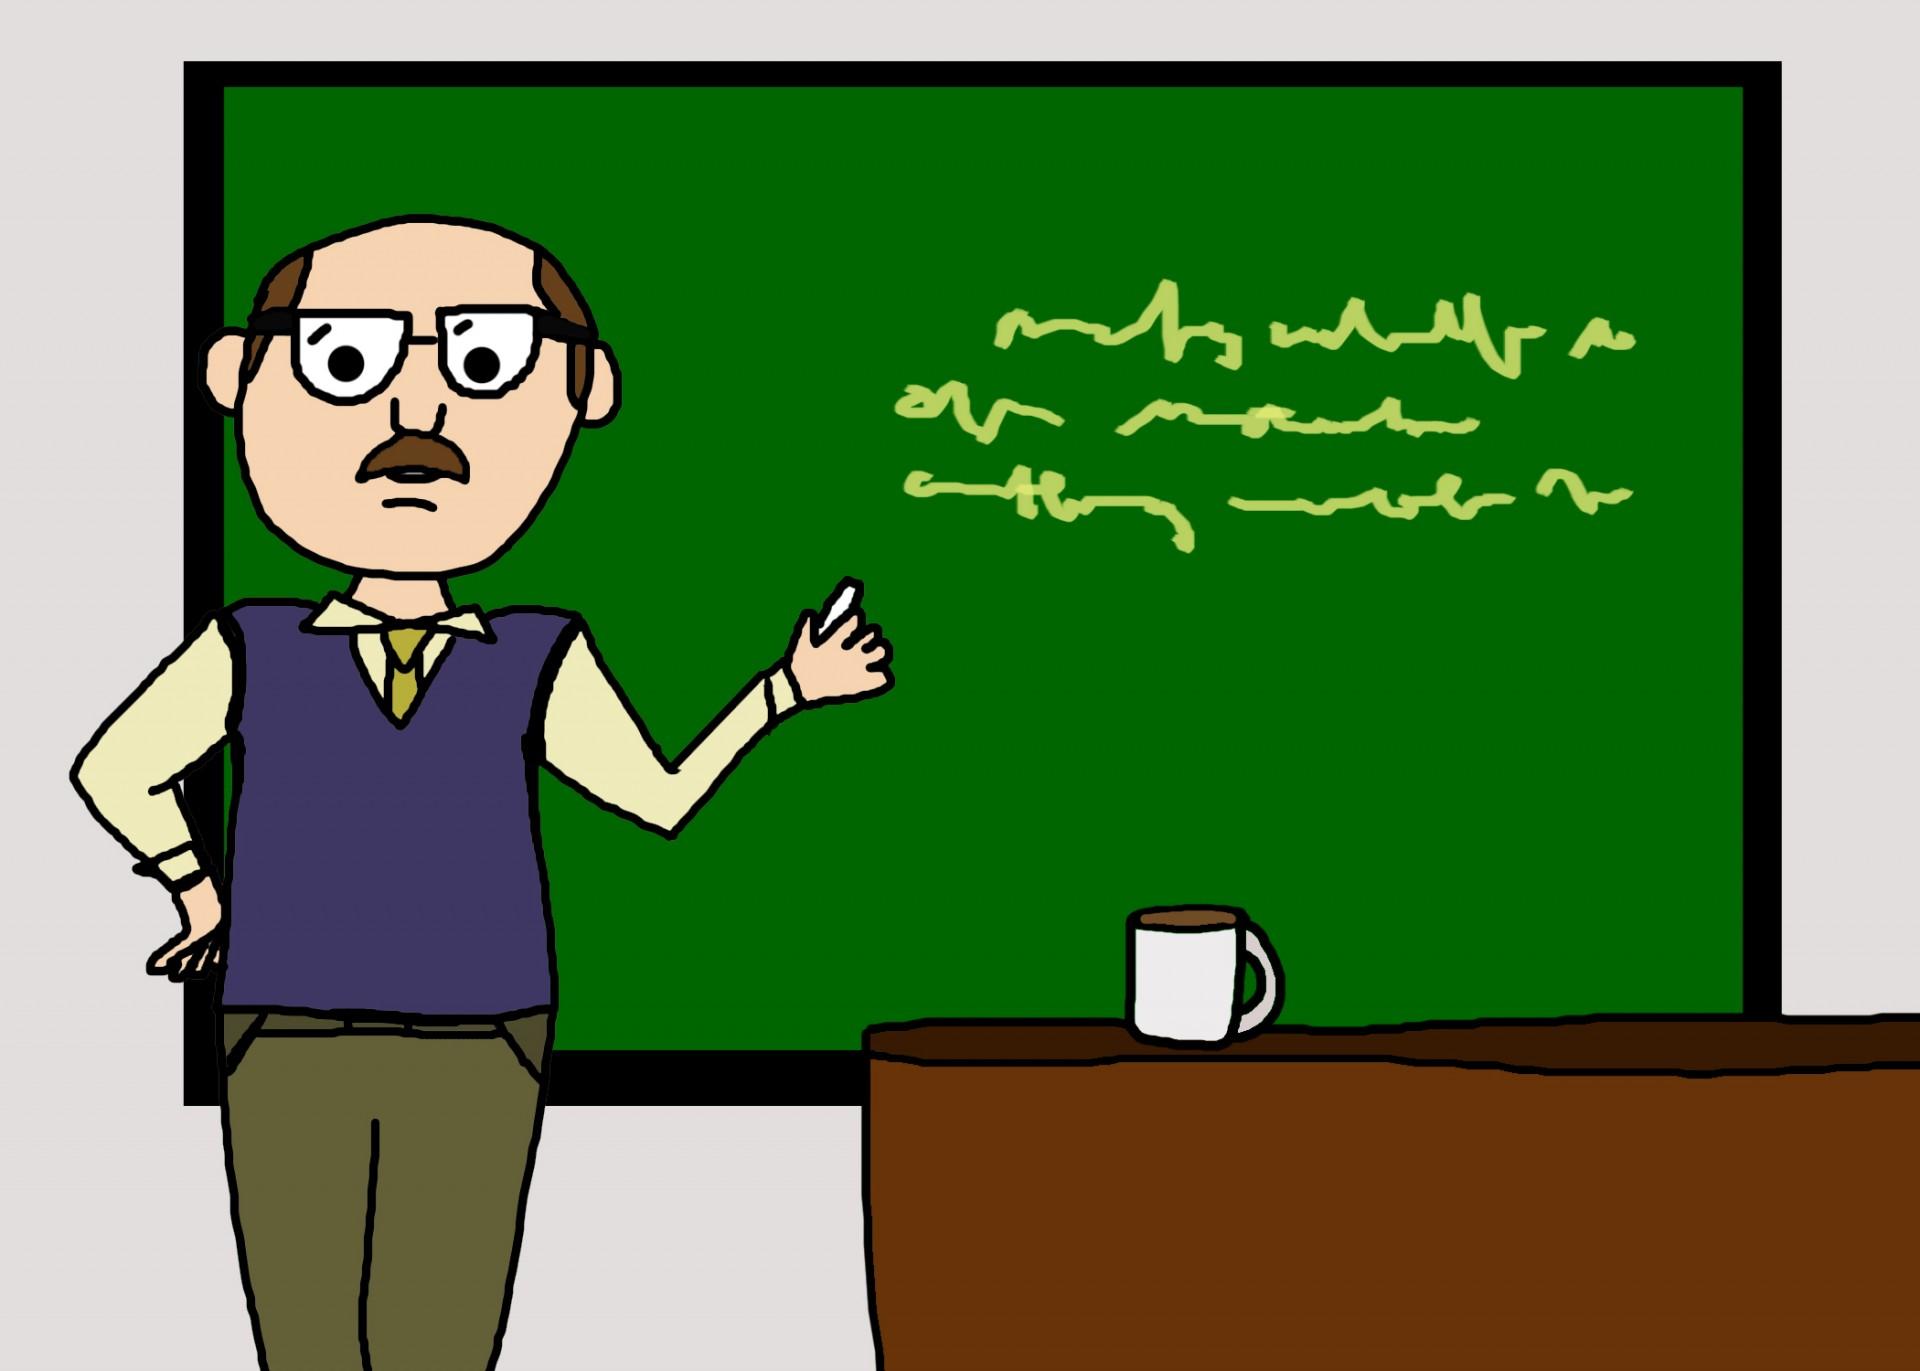 Liberal professor brainwashes students